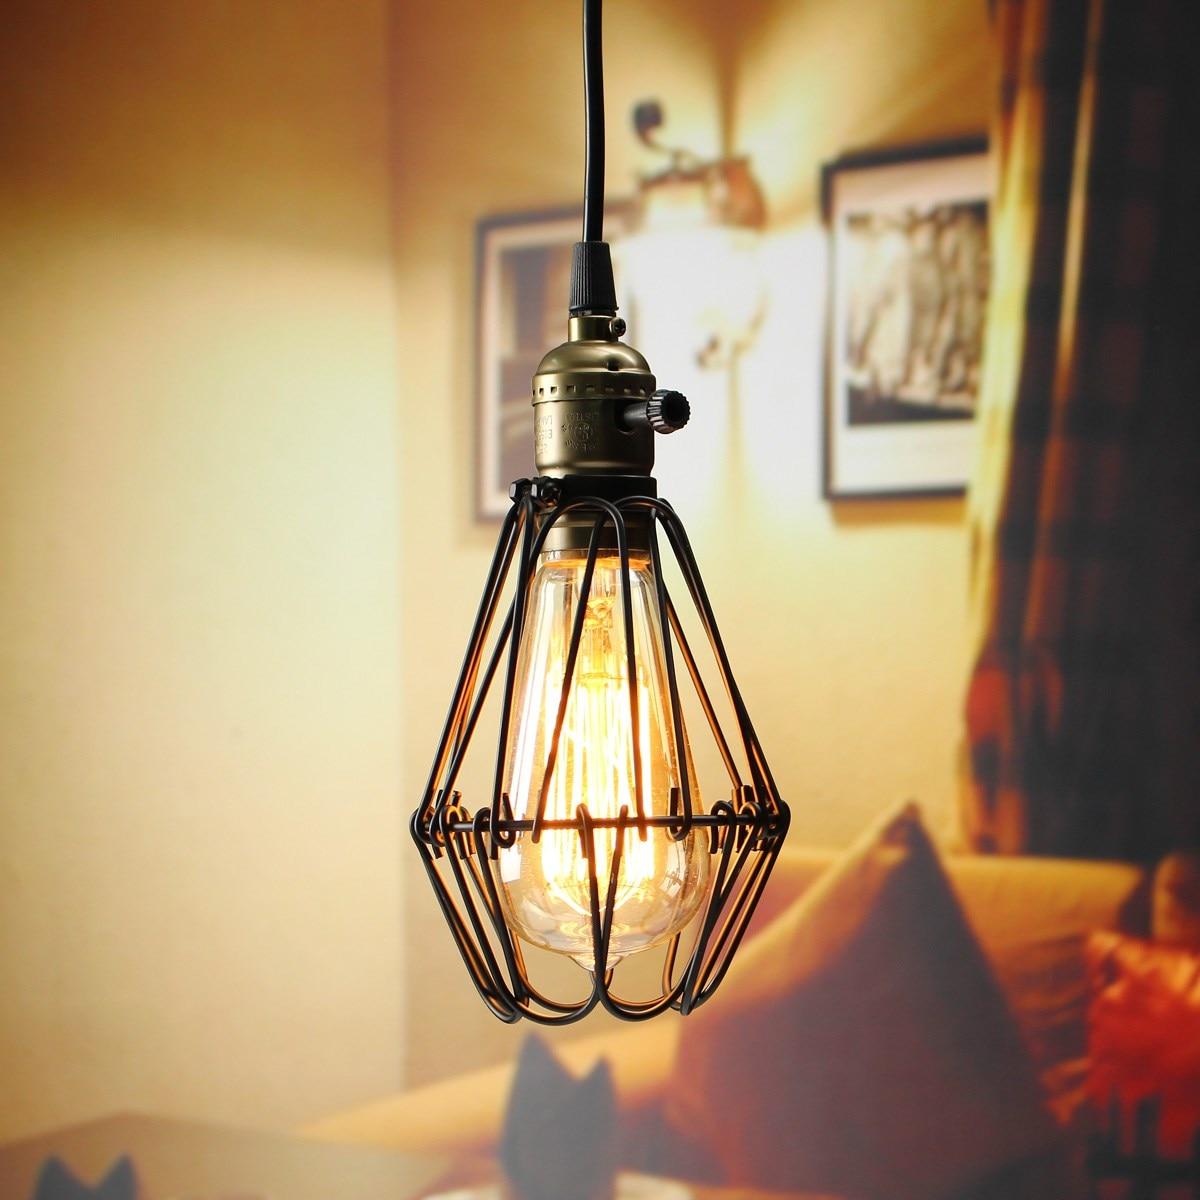 Hot Sale E27 40W ST64 Loft Metal Retro Industrial Pendant Light Black Wall Hanging Lamp Shade Holder Bulb Socket 110-220V